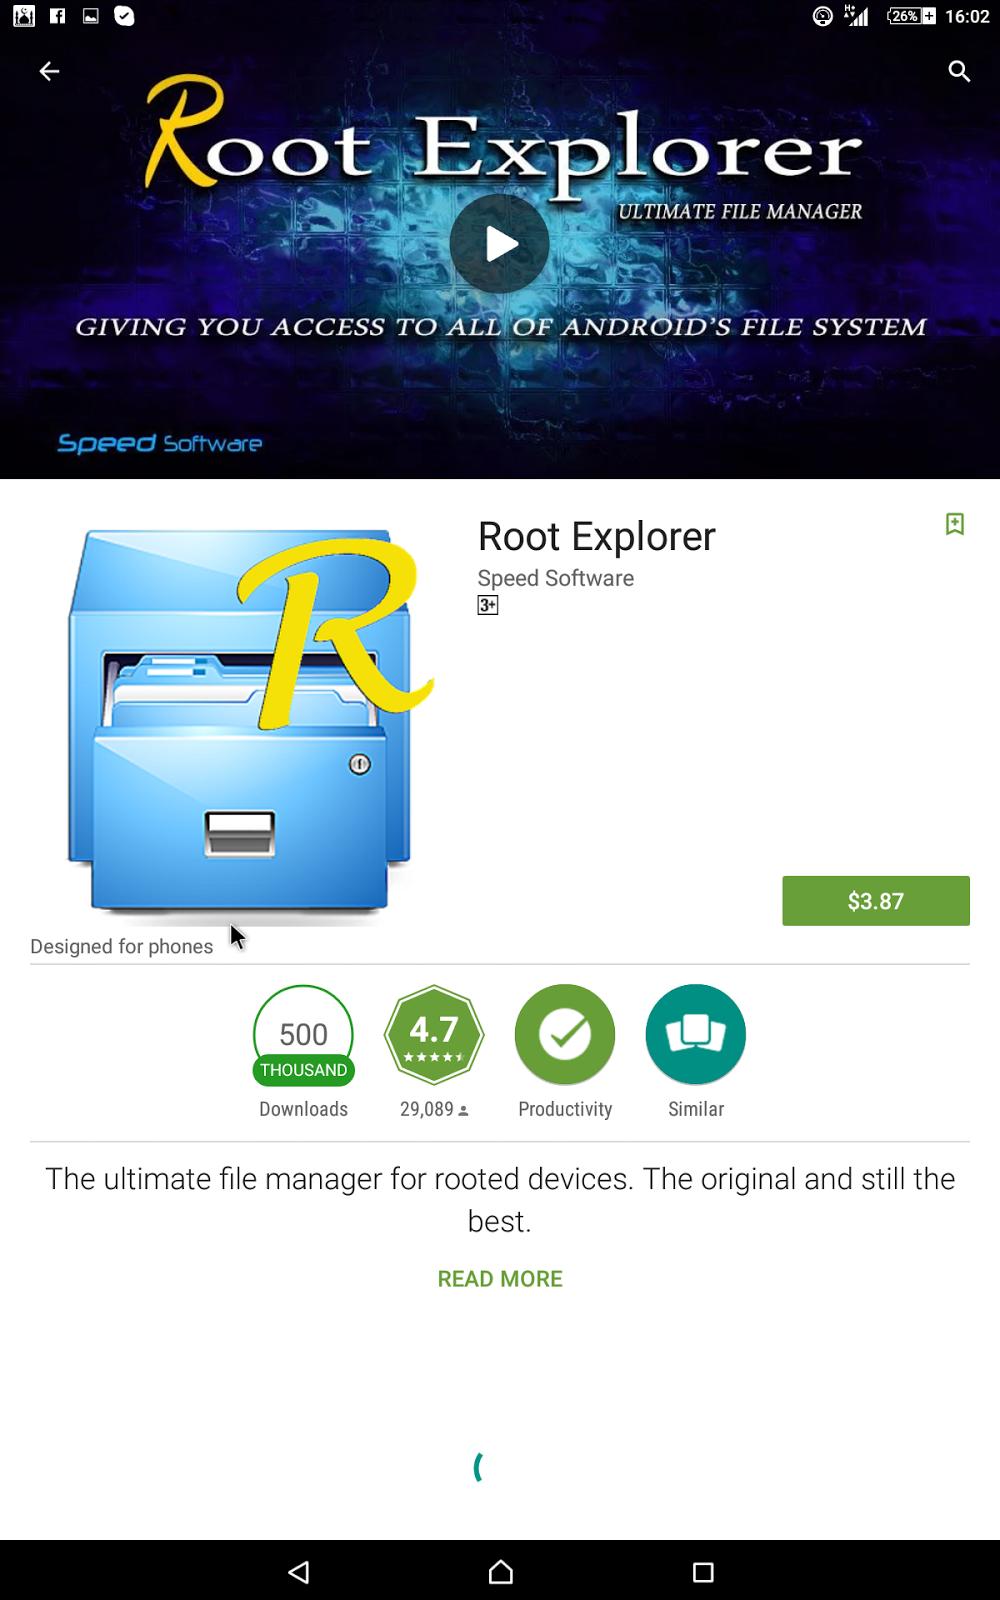 Root Explorer apk pro 3 6 6 Download free here | Genius Android